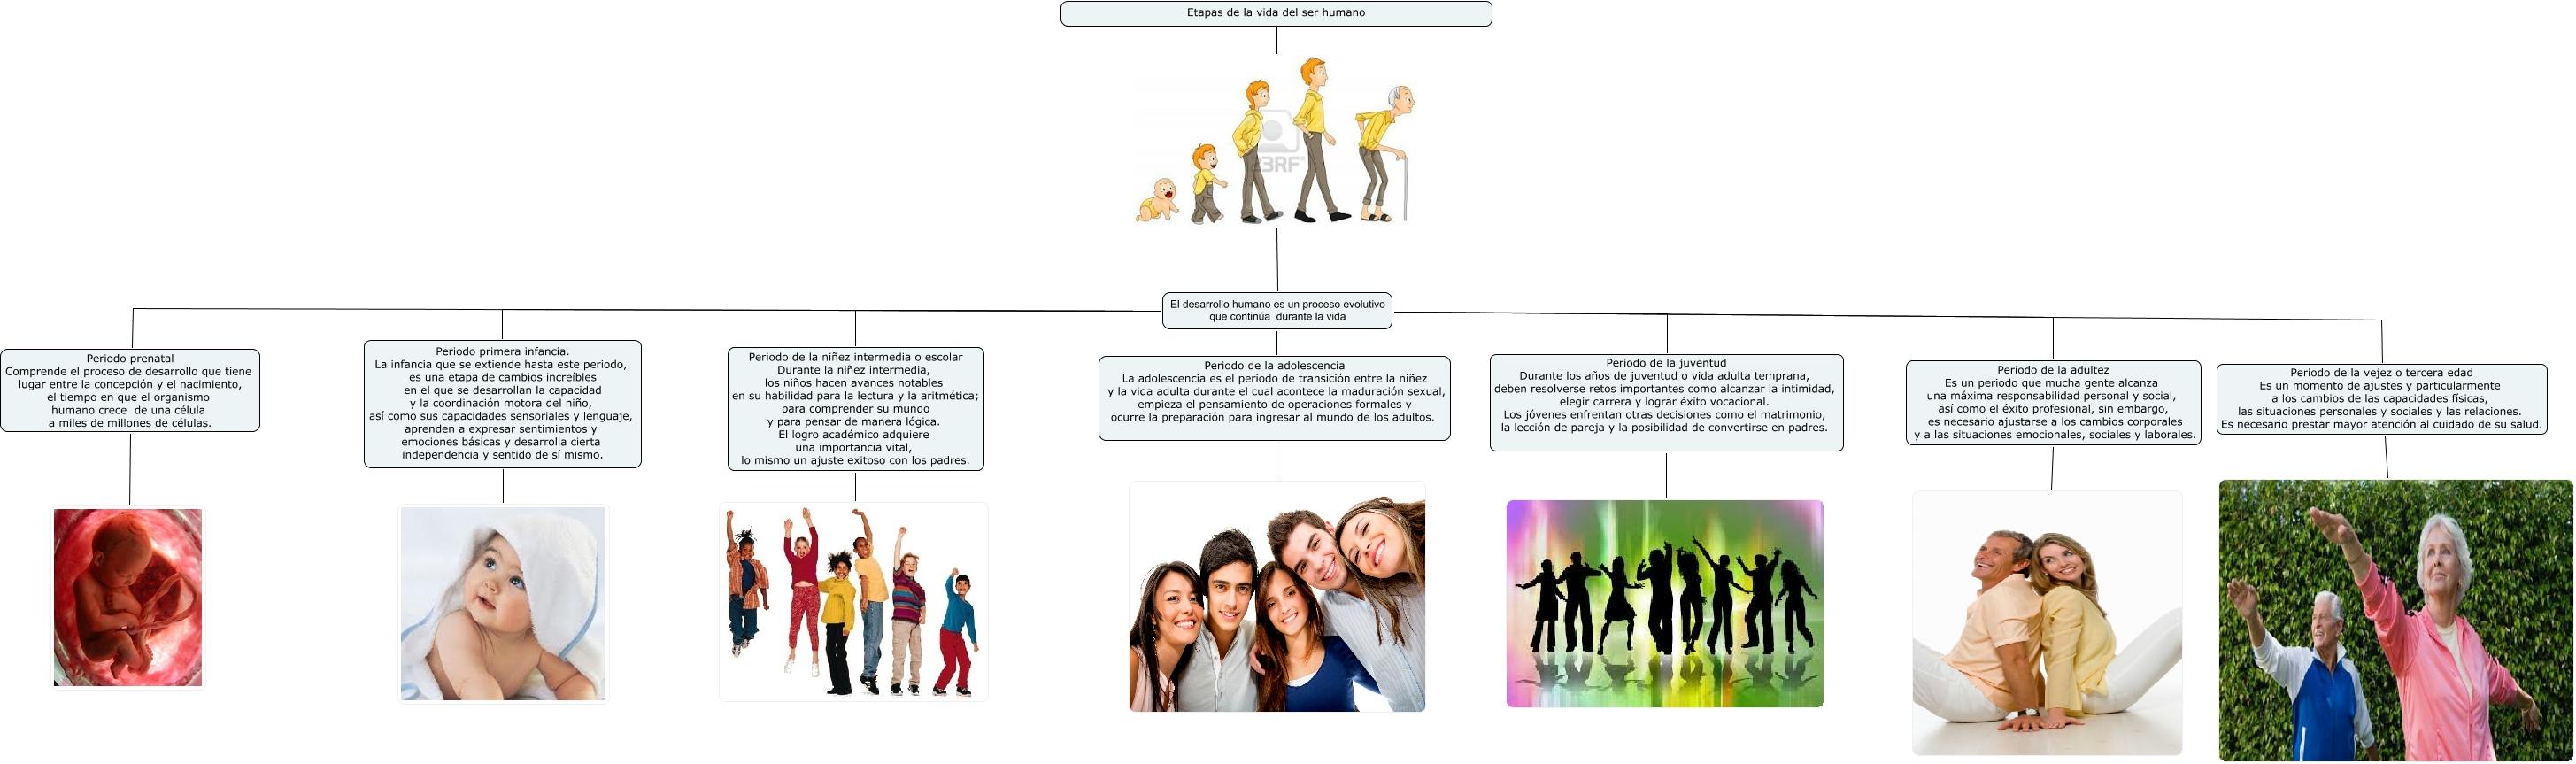 ebb6ac367 etapas del desarrollo humano